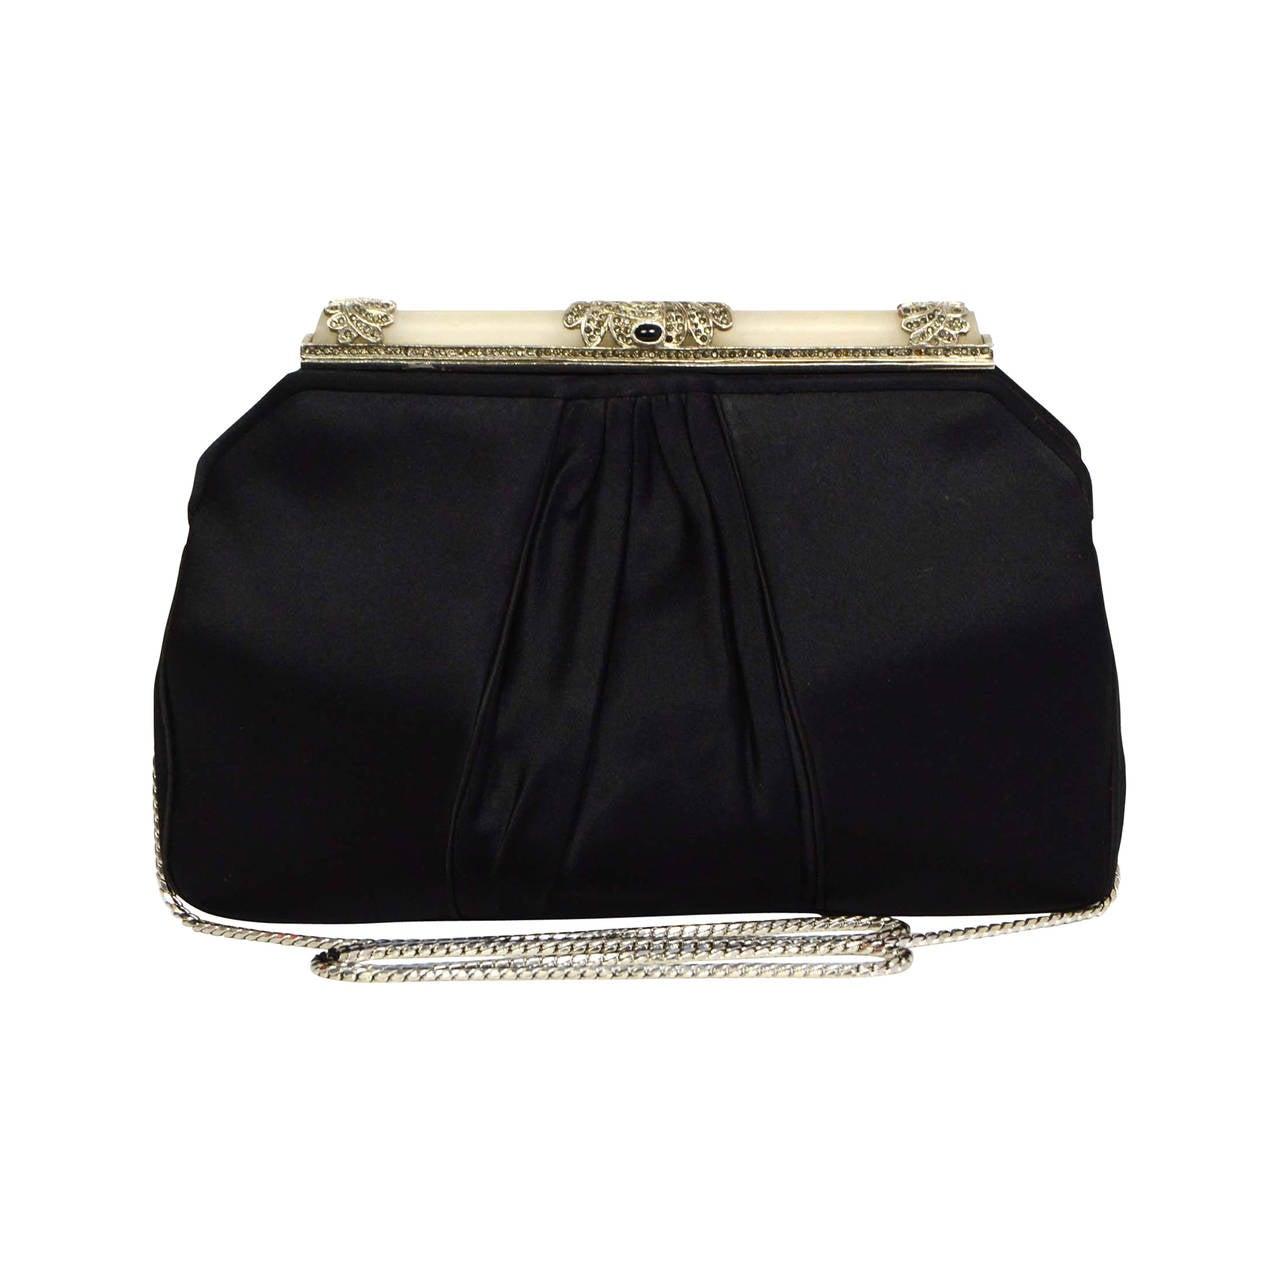 JUDITH LEIBER Black Satin Art Deco Evening Bag SHW 1